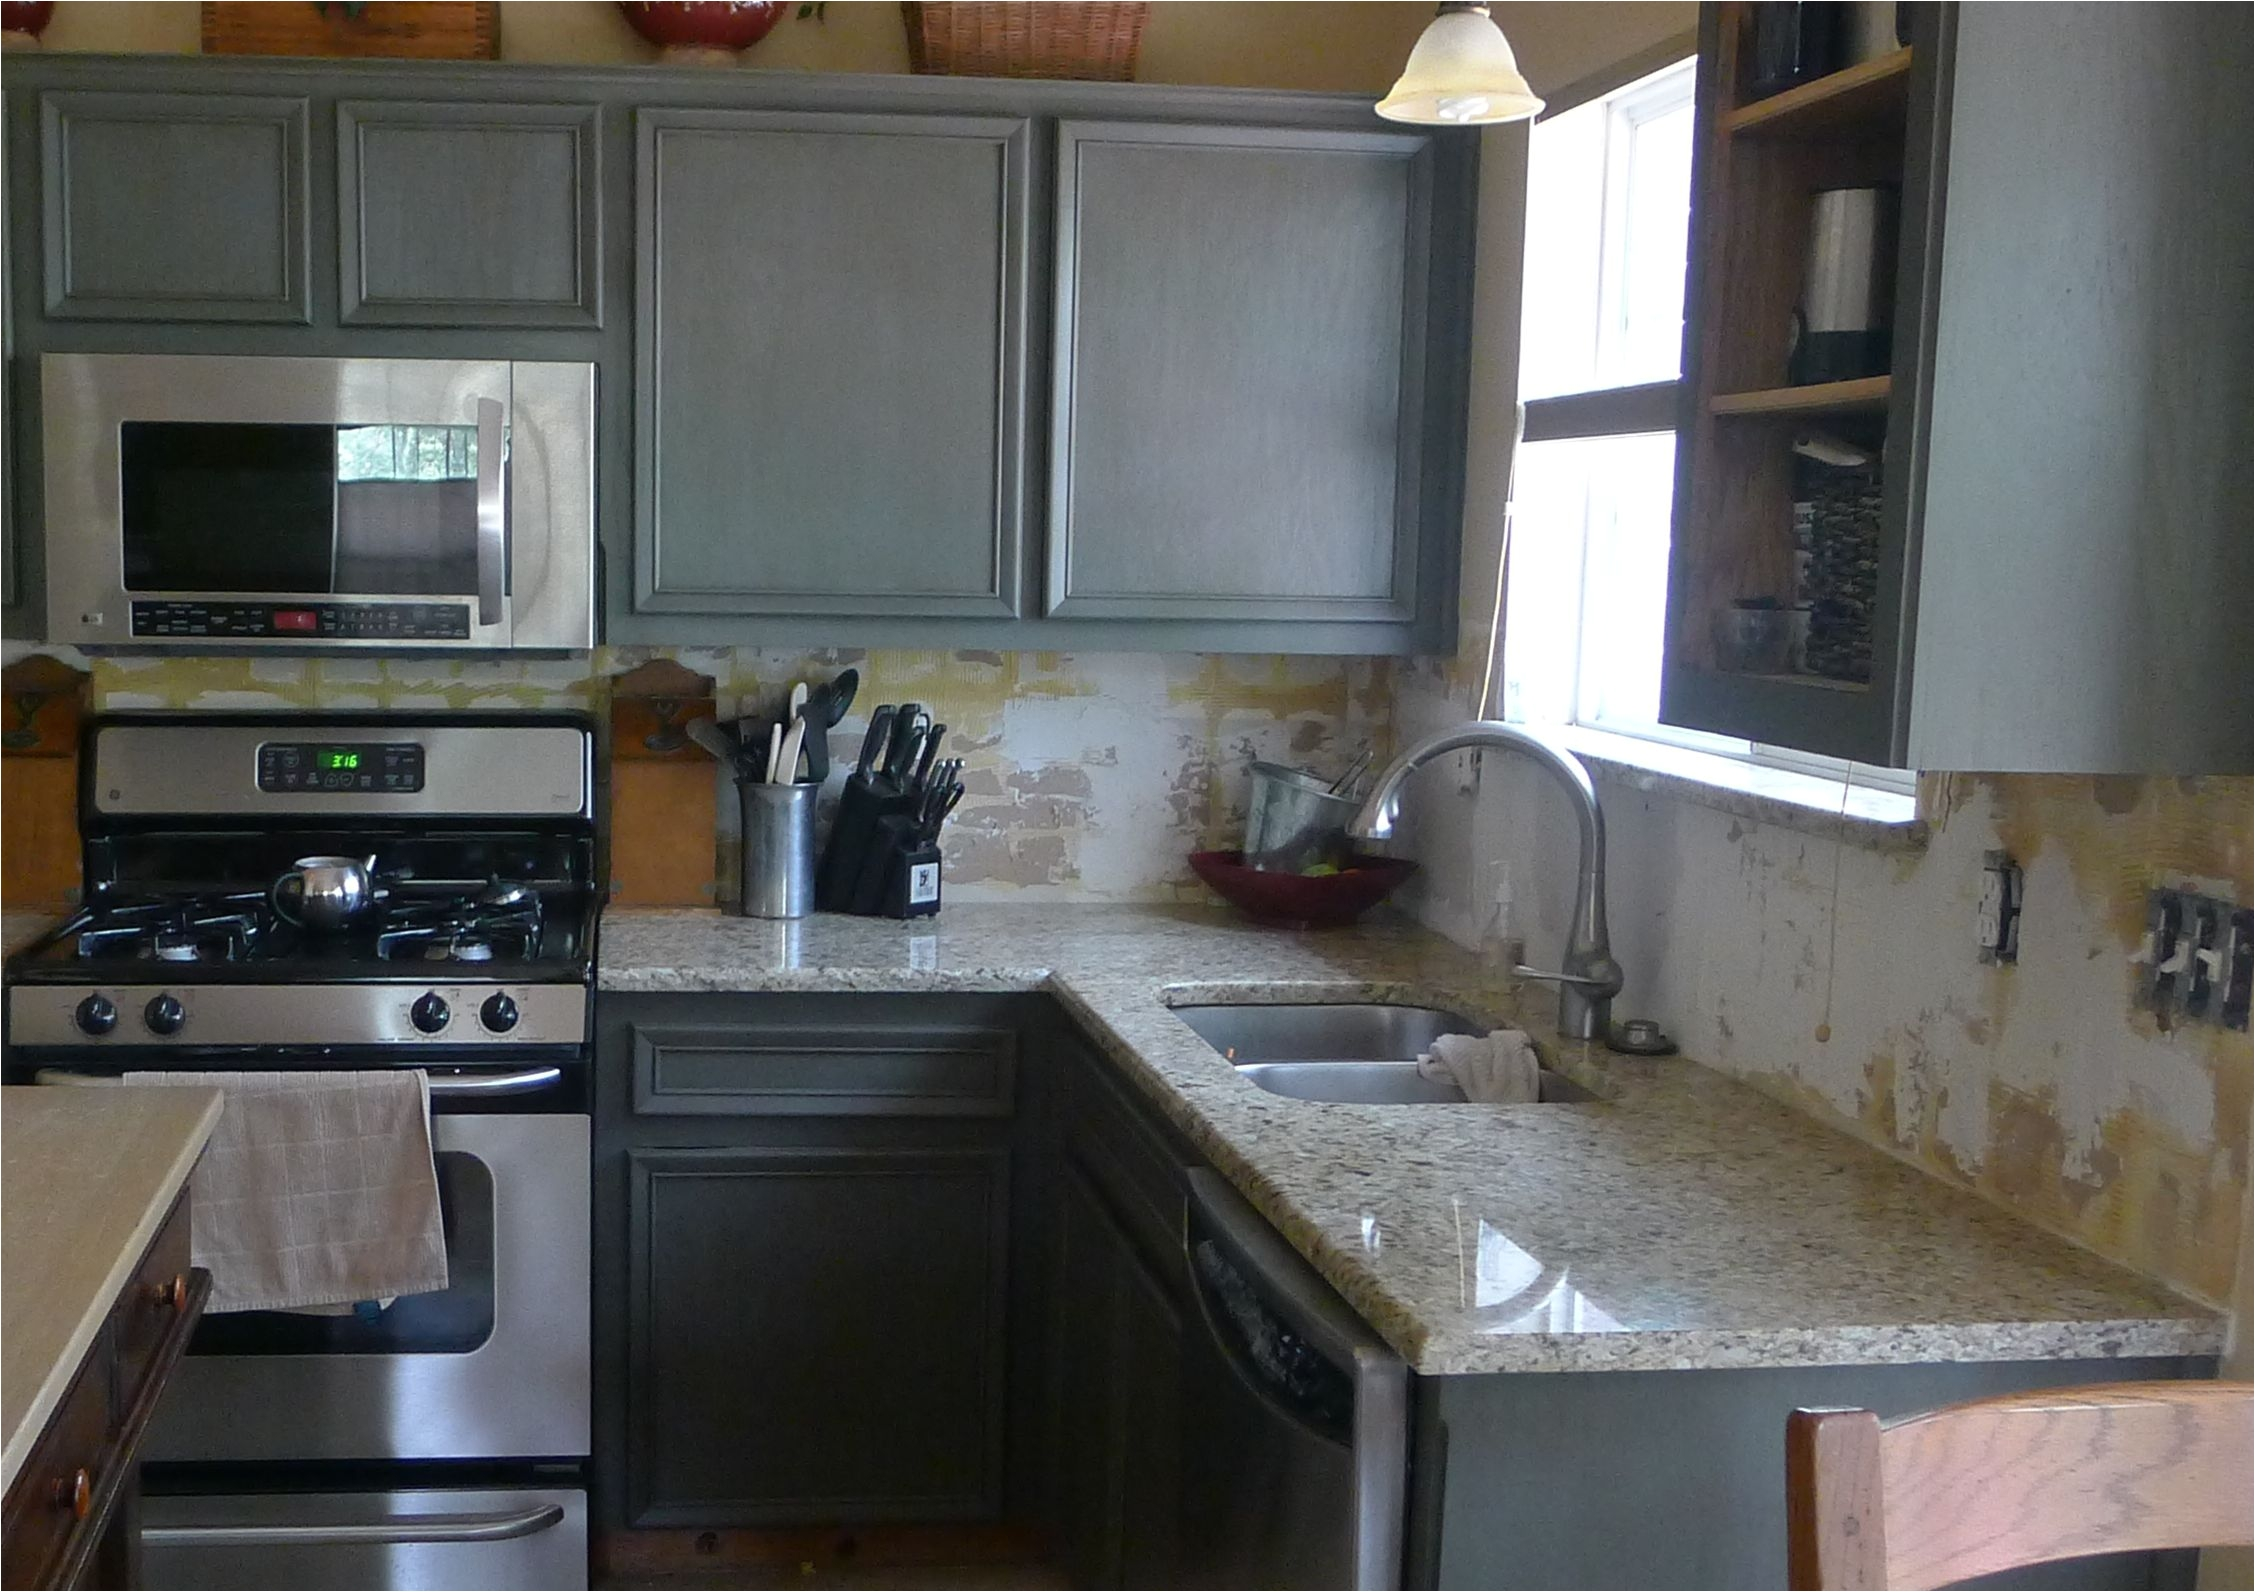 for jello grey testimonial gallery rust oleum cabinet transformationsa a revolutionary kitchen transformation system